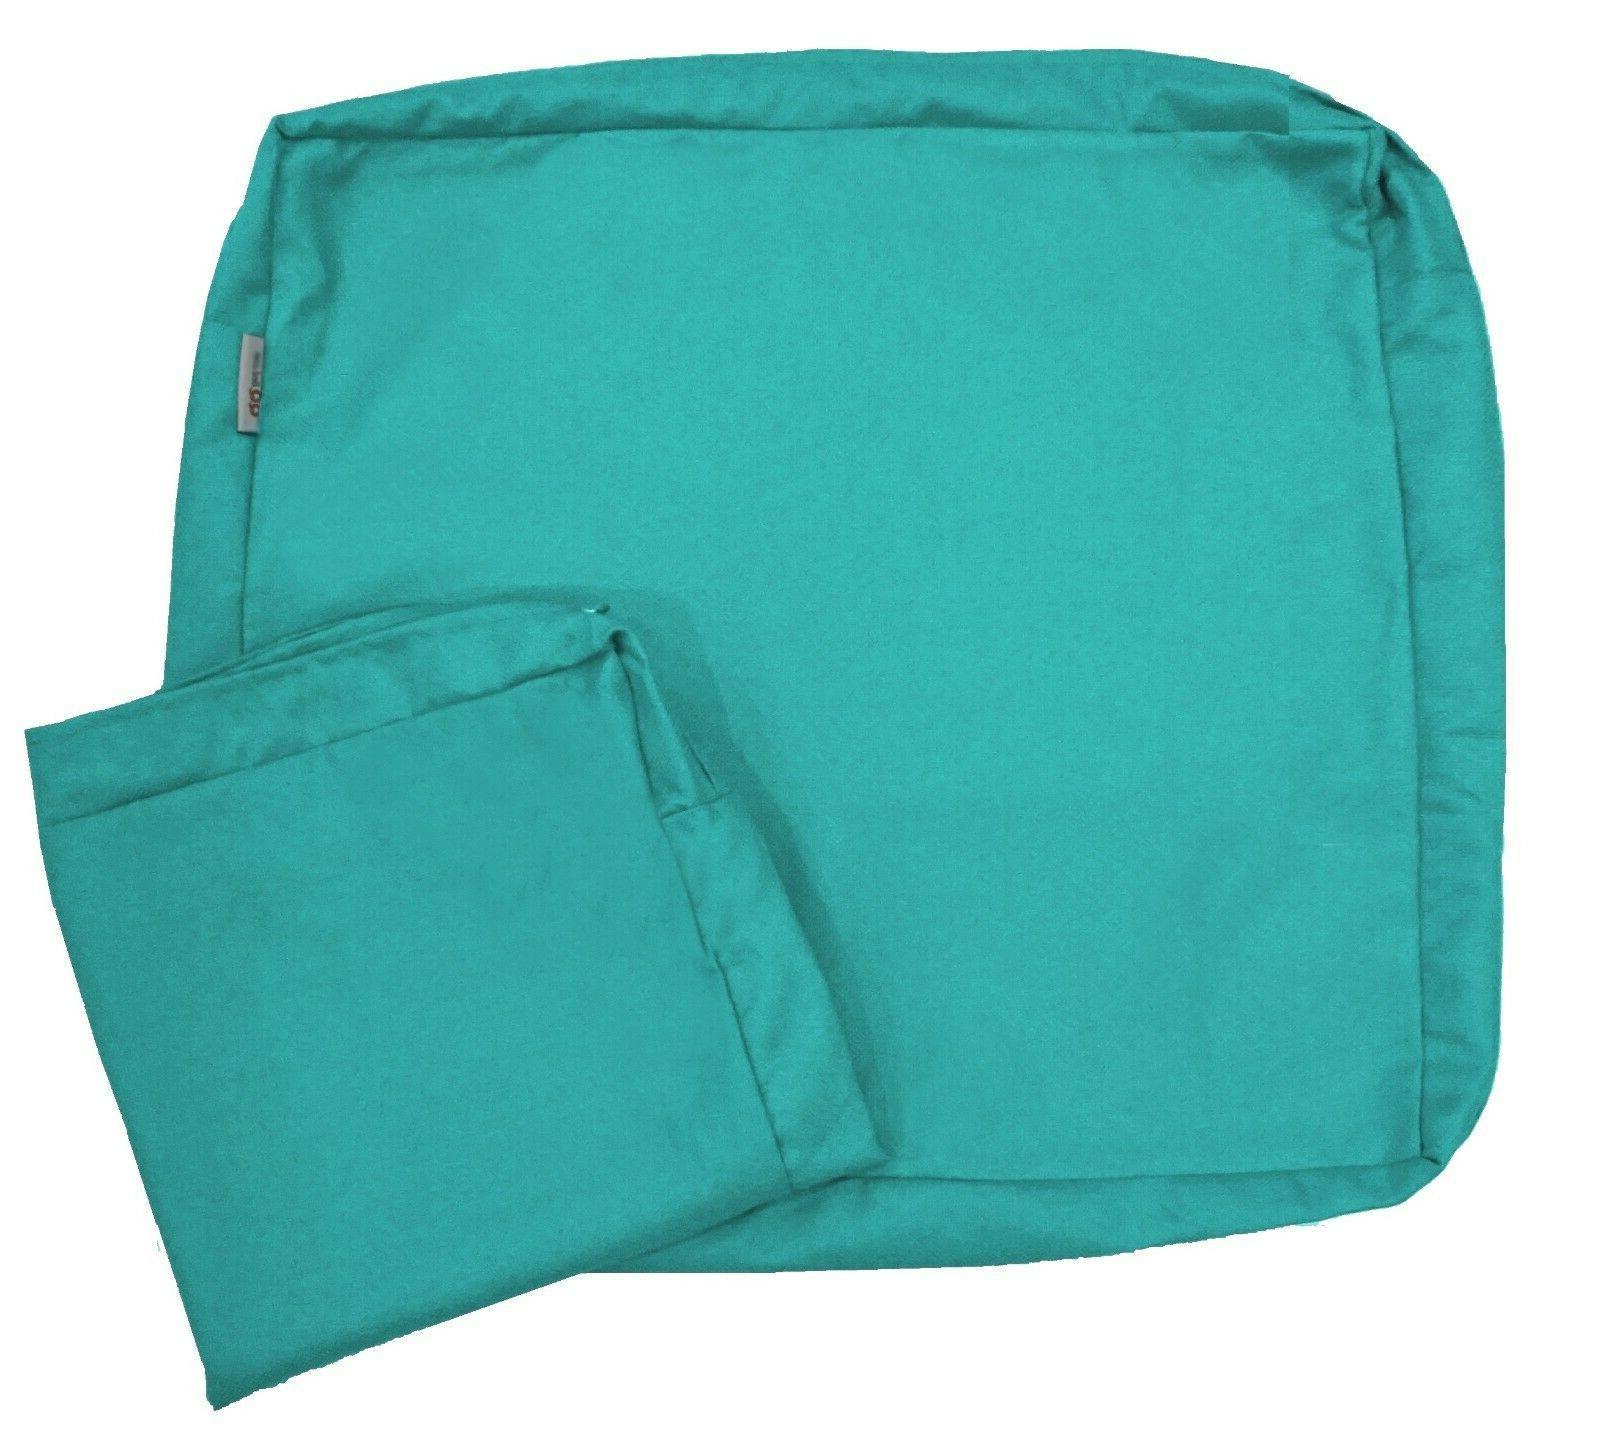 "Waterproof Patio Cushion Cover Case 20""X18""X4"" Peacock"